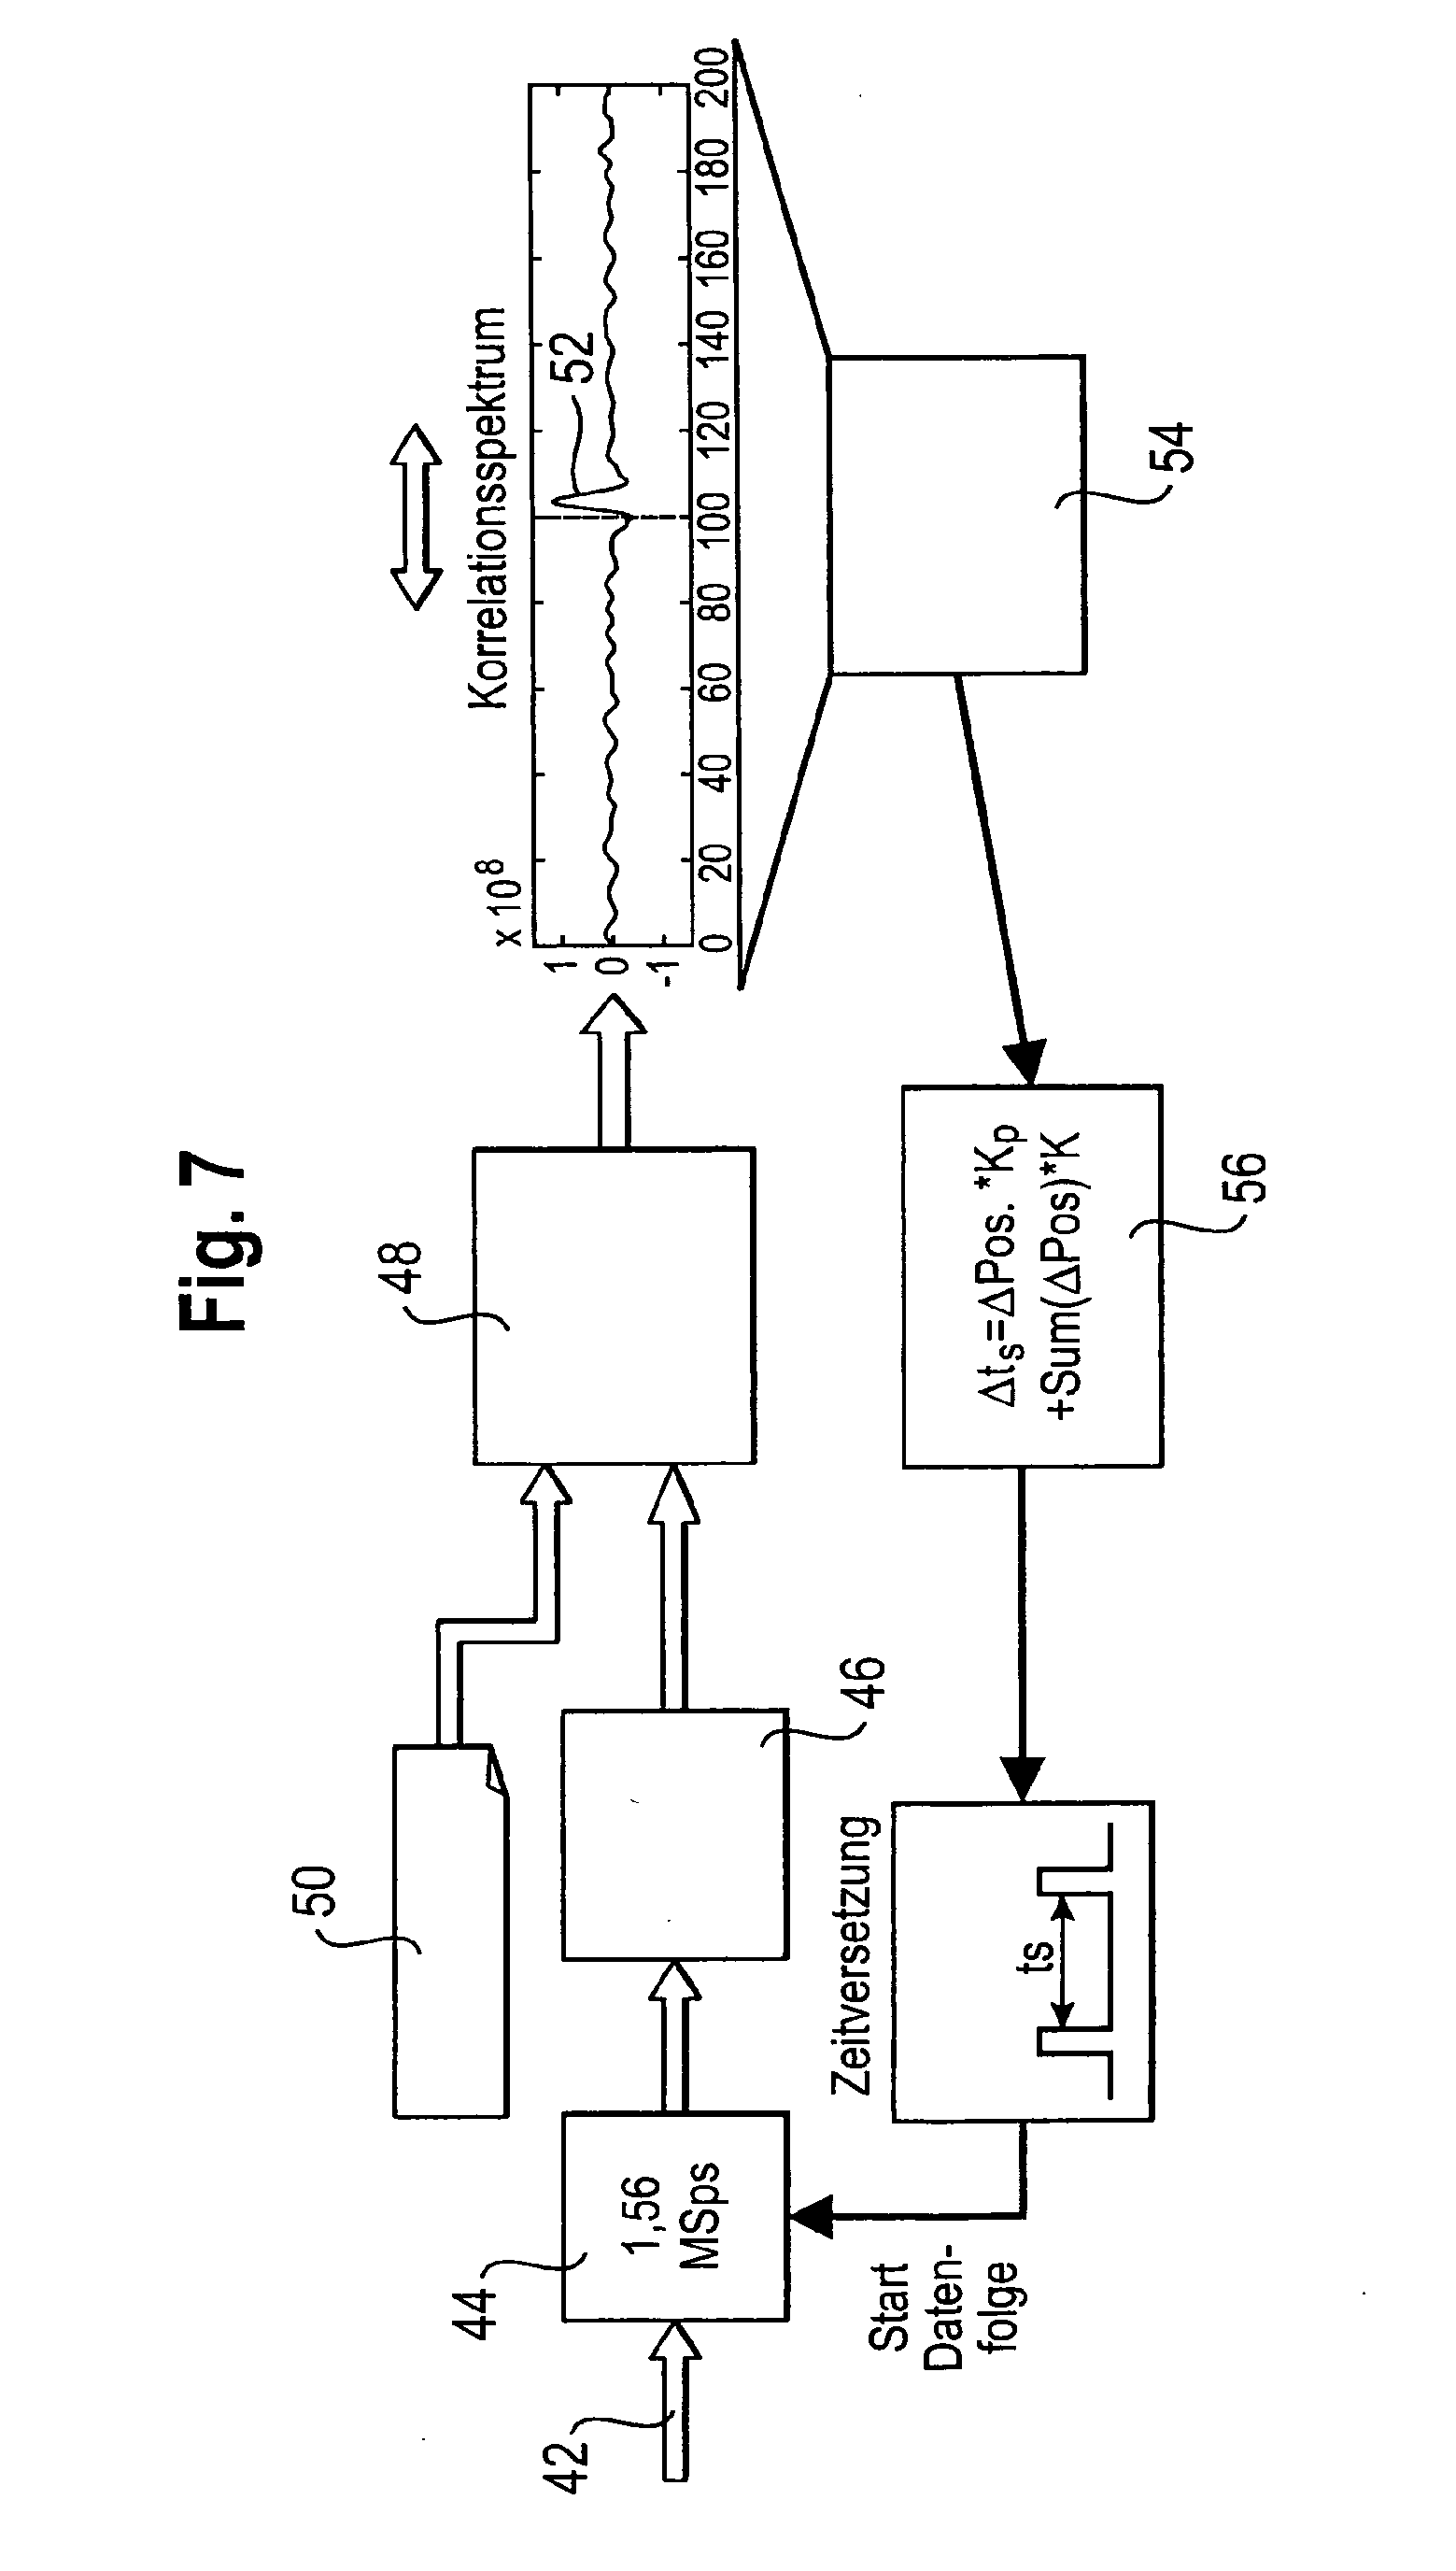 专利ep2015110a1 - capteur optoélectronique